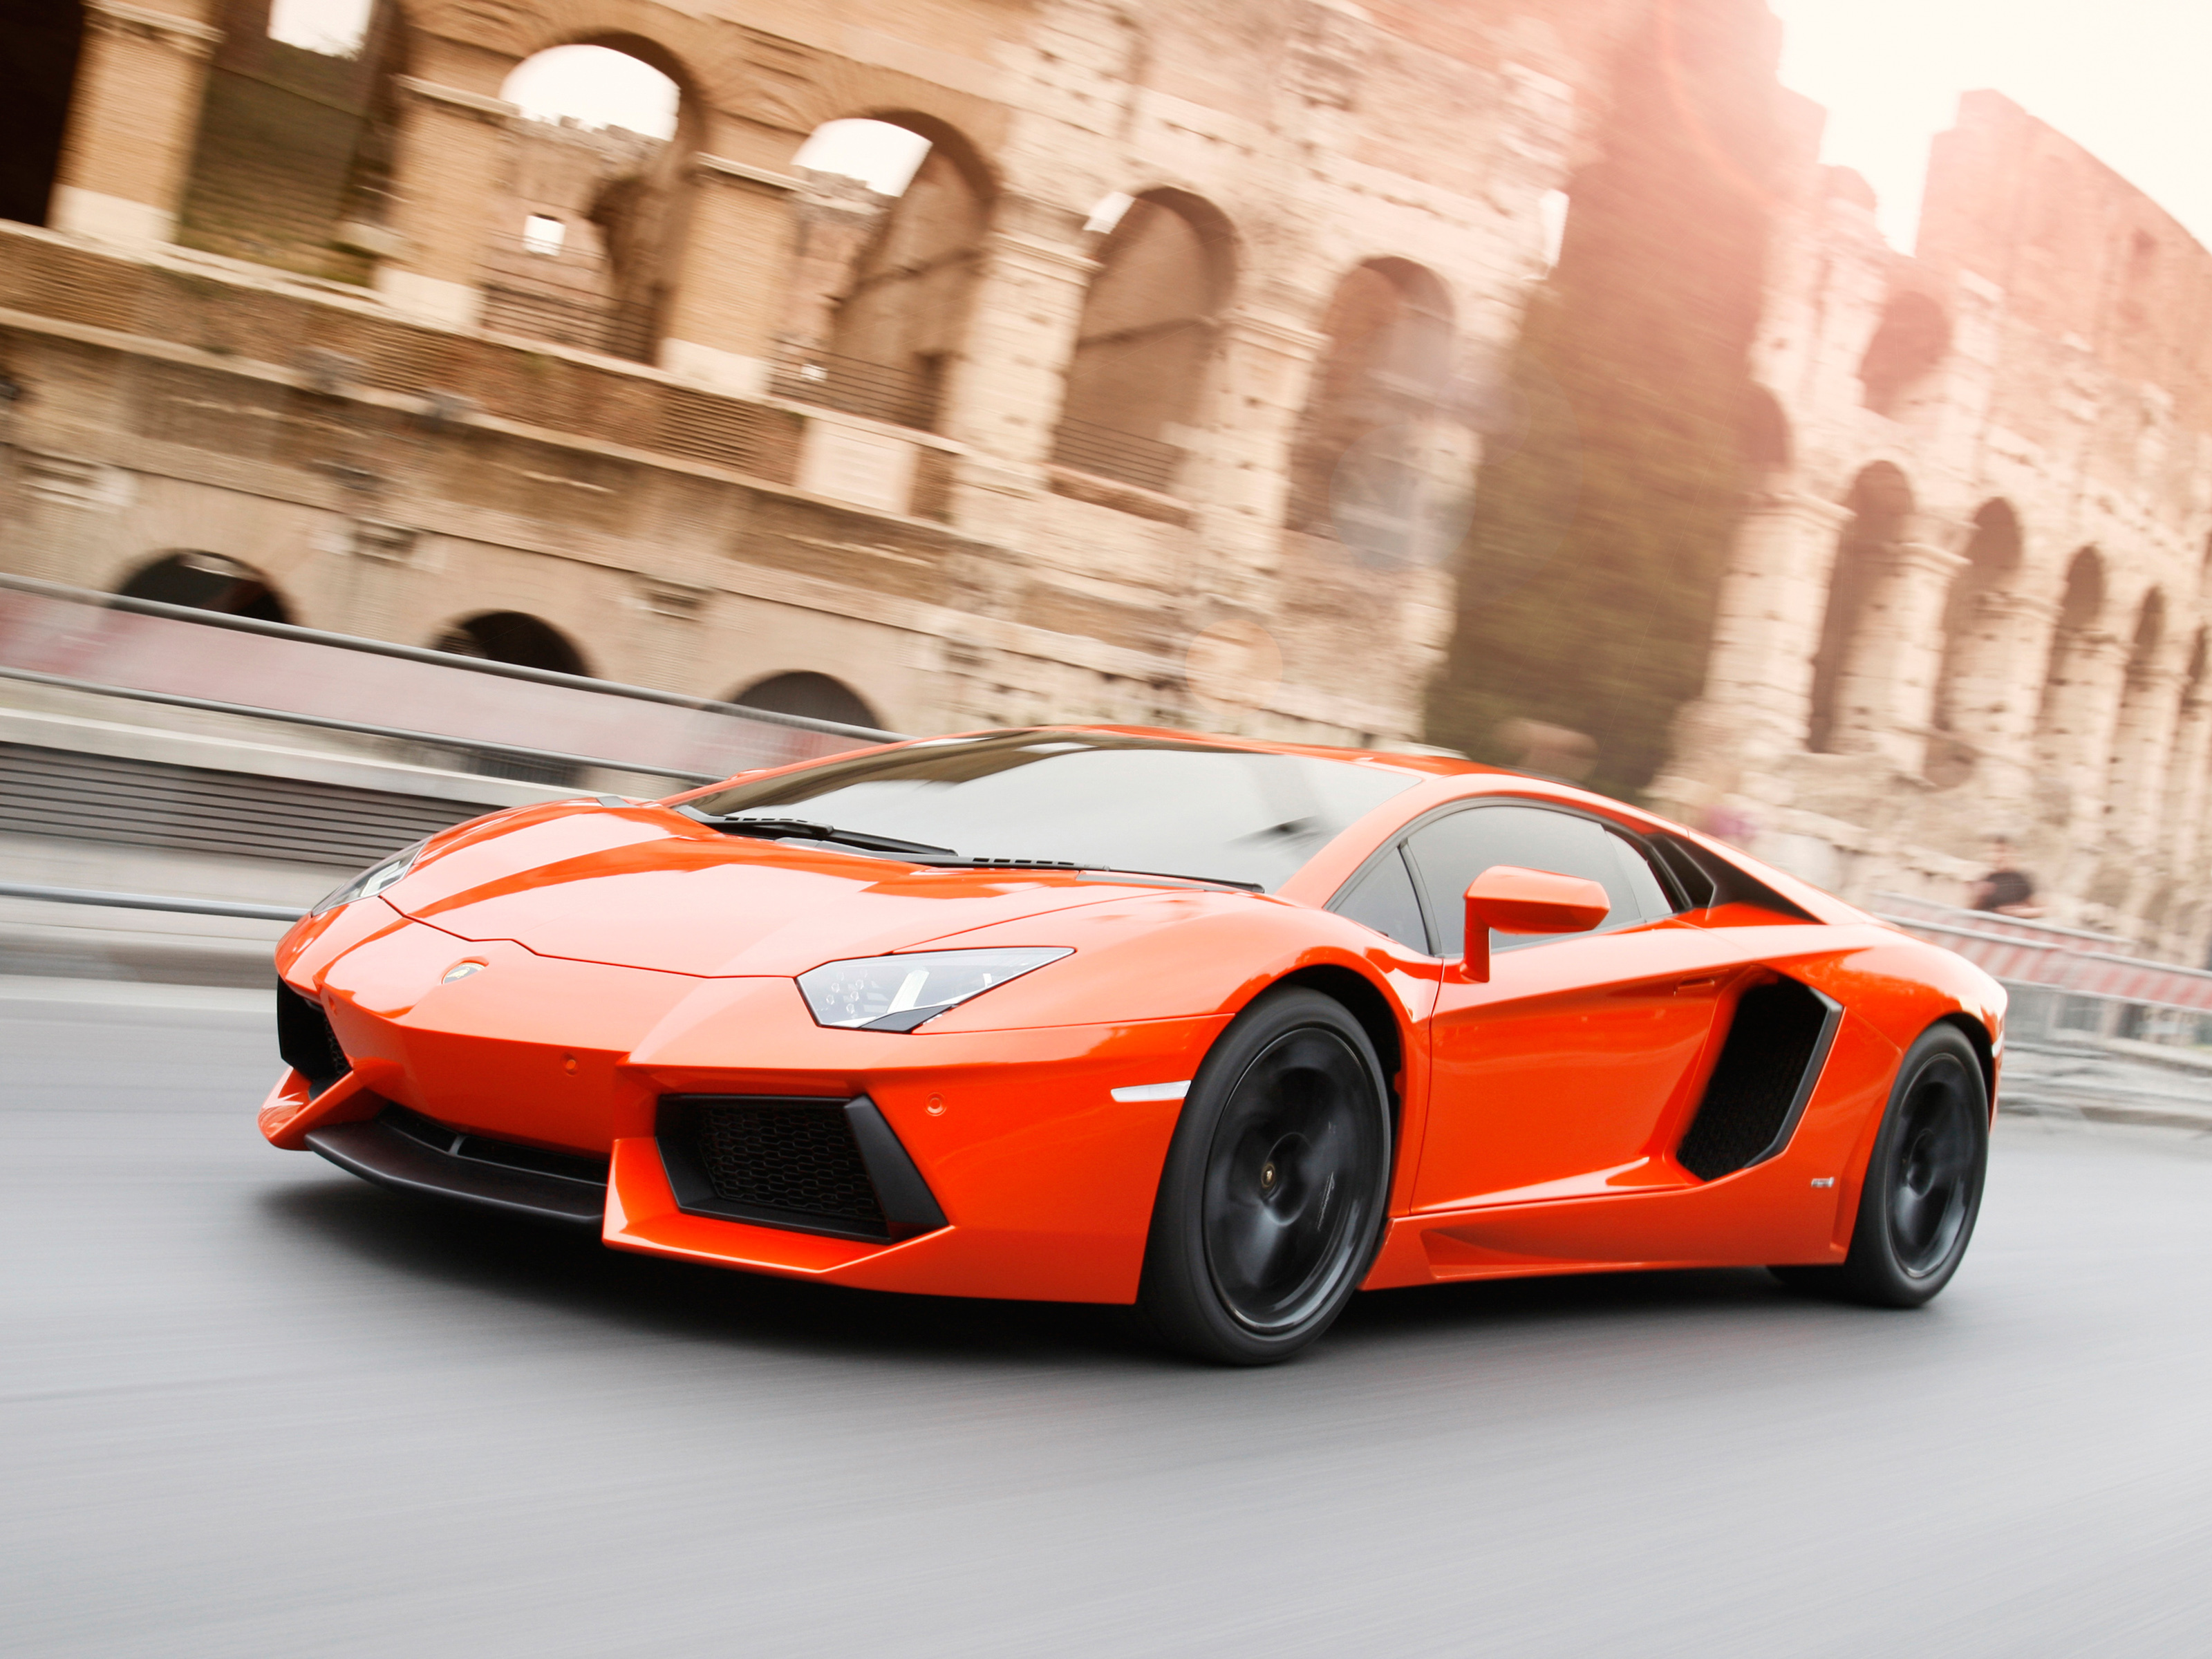 125731 download wallpaper Cars, Lamborghini, Aventador, Lp 700-4, Auto screensavers and pictures for free